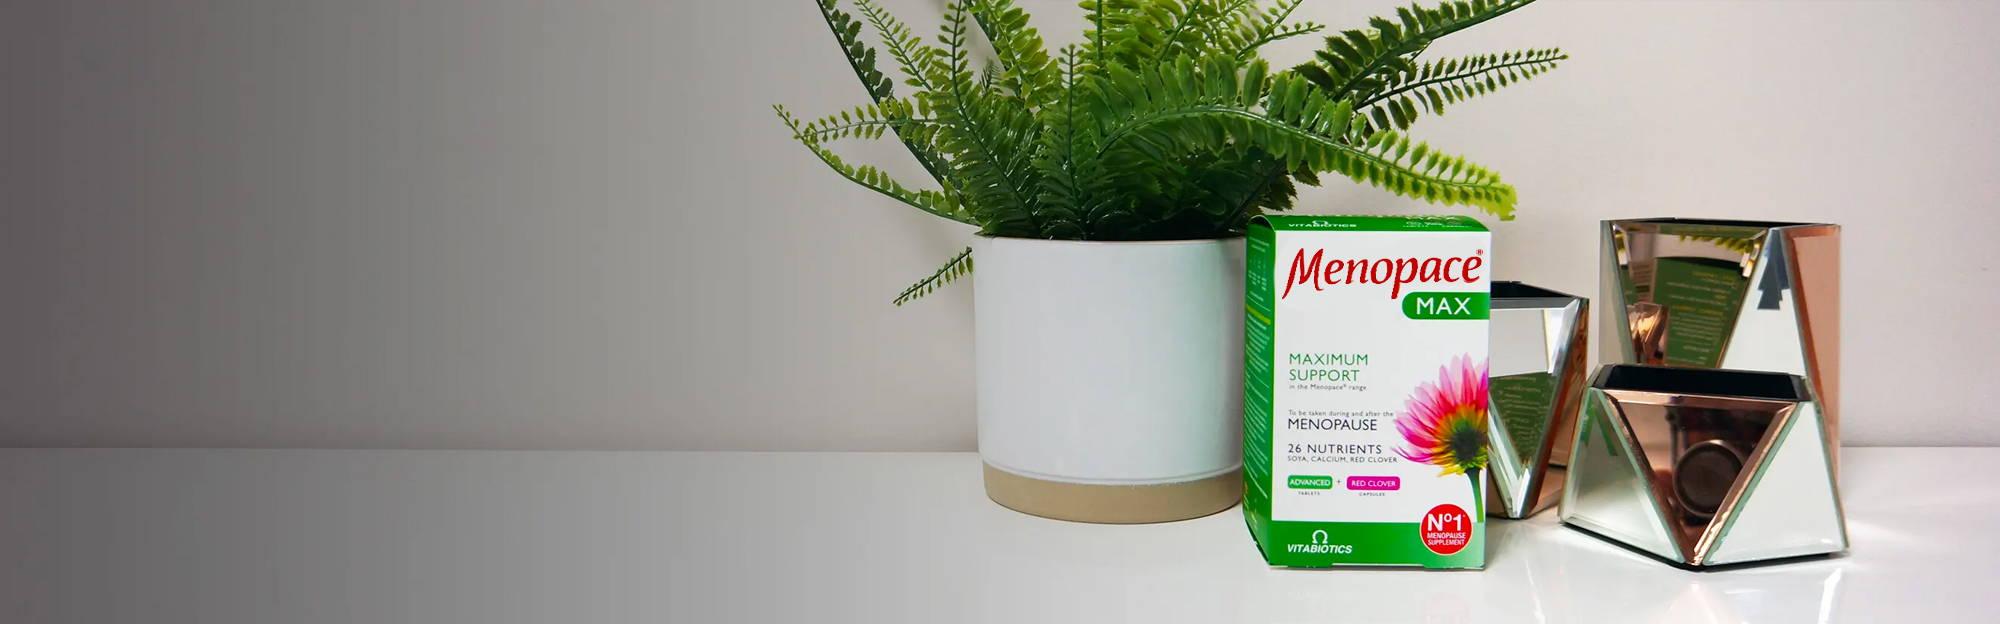 Menopace Max Pack On Display